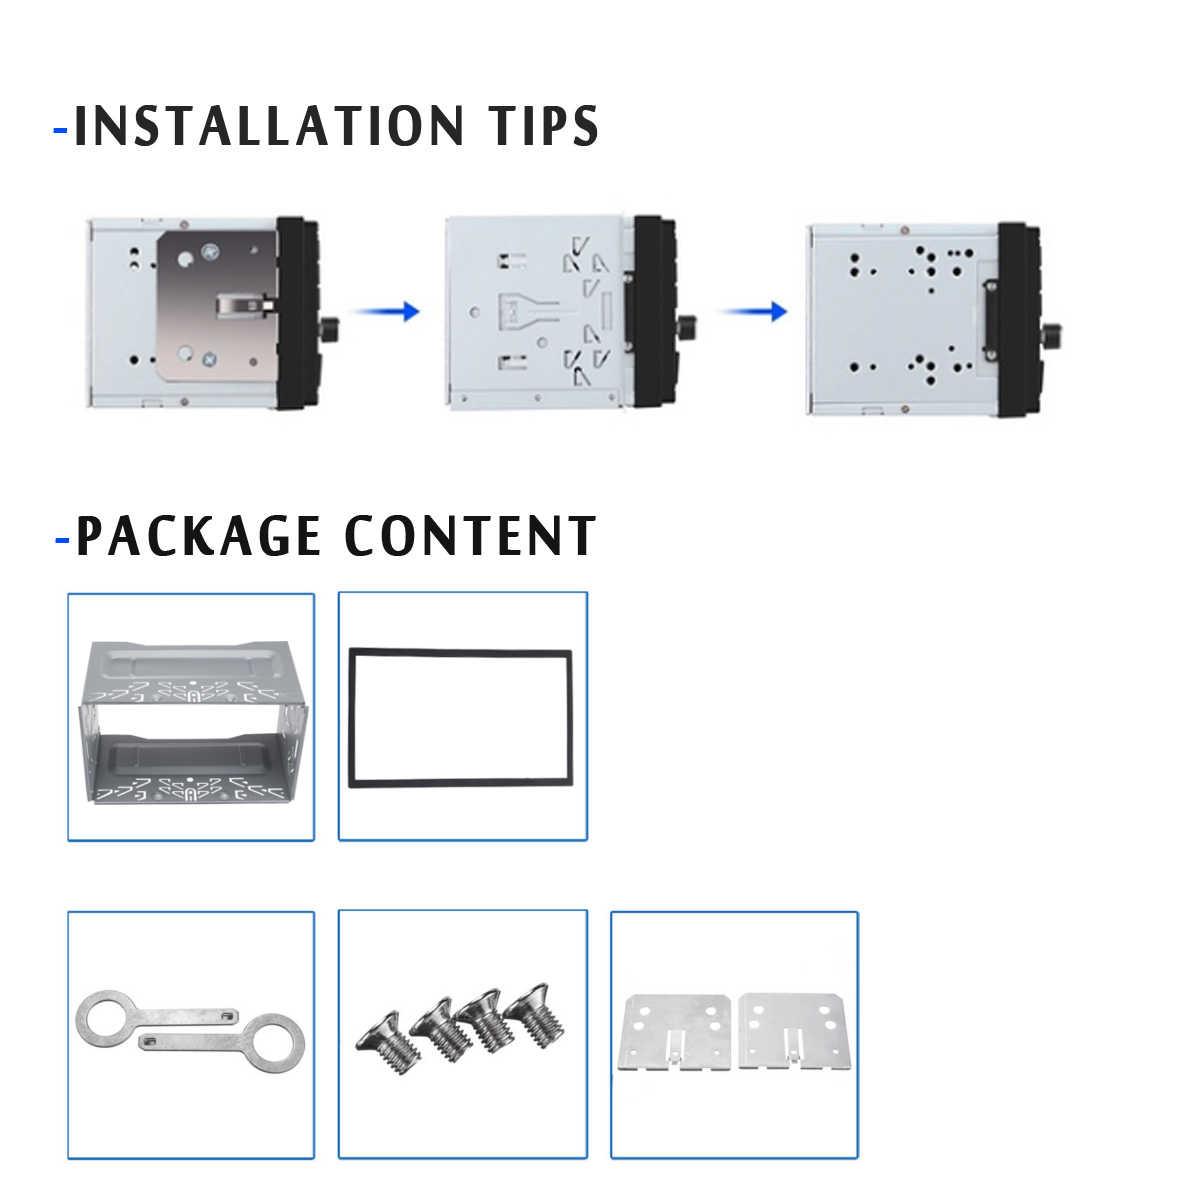 Universal Araç Stereo Radyo DVD Fasya Paneli Plaka Çerçeve 2Din Panel Ses Dash Montaj Kiti Adaptörü Montaj Kafes Çerçeve 80x 110x100mm